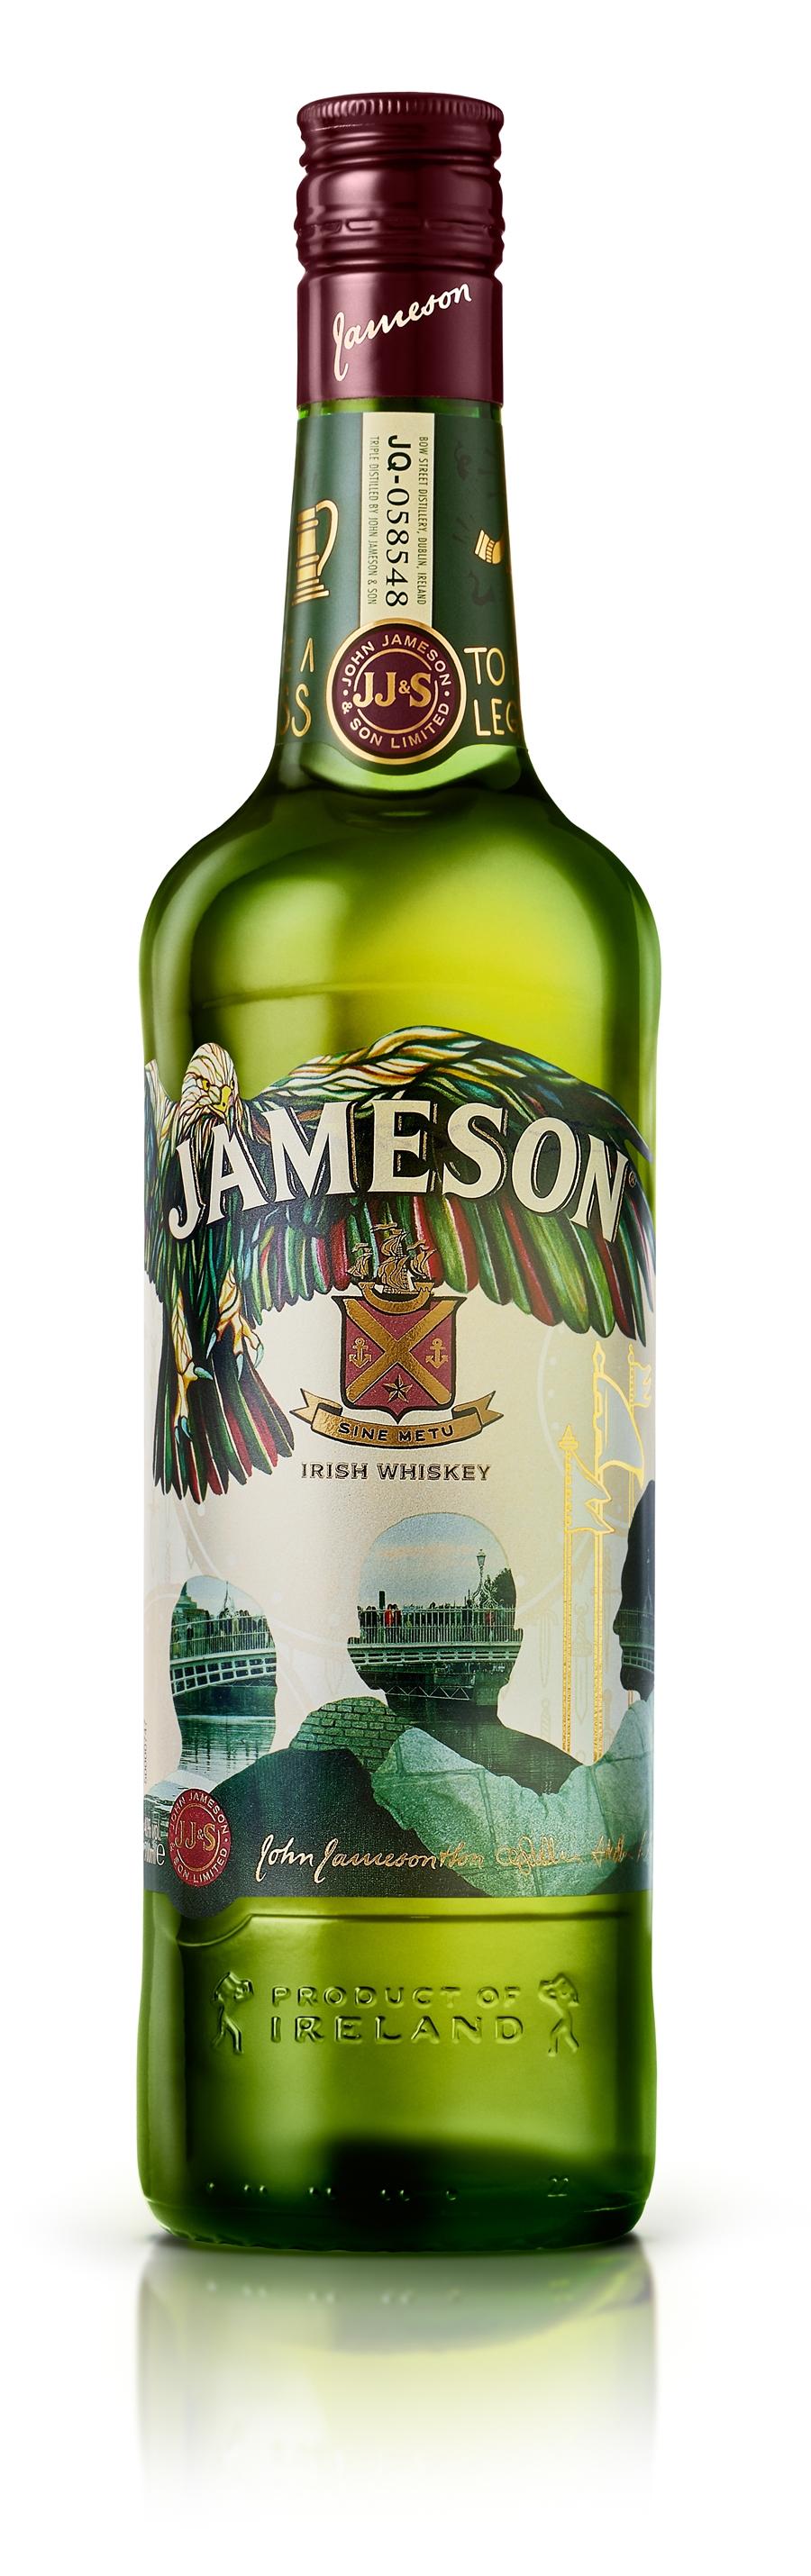 Jameson – виски св. Патрика 2018